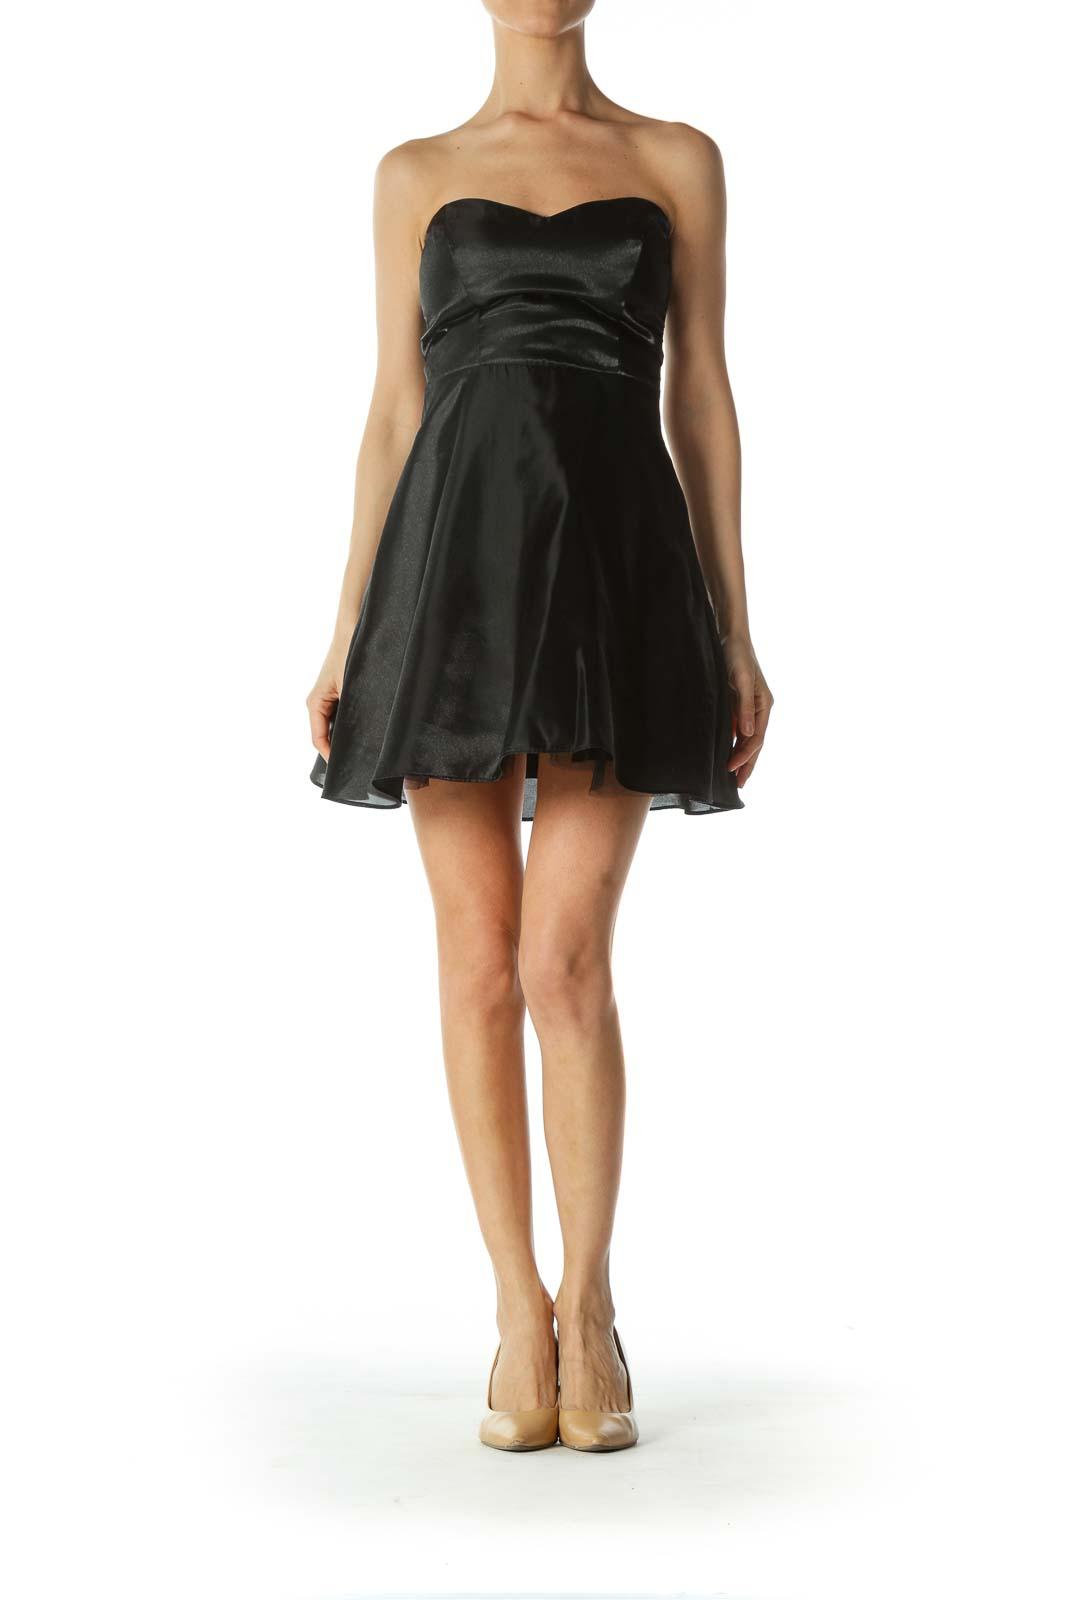 Black Shimmery Strapless Cocktail Dress